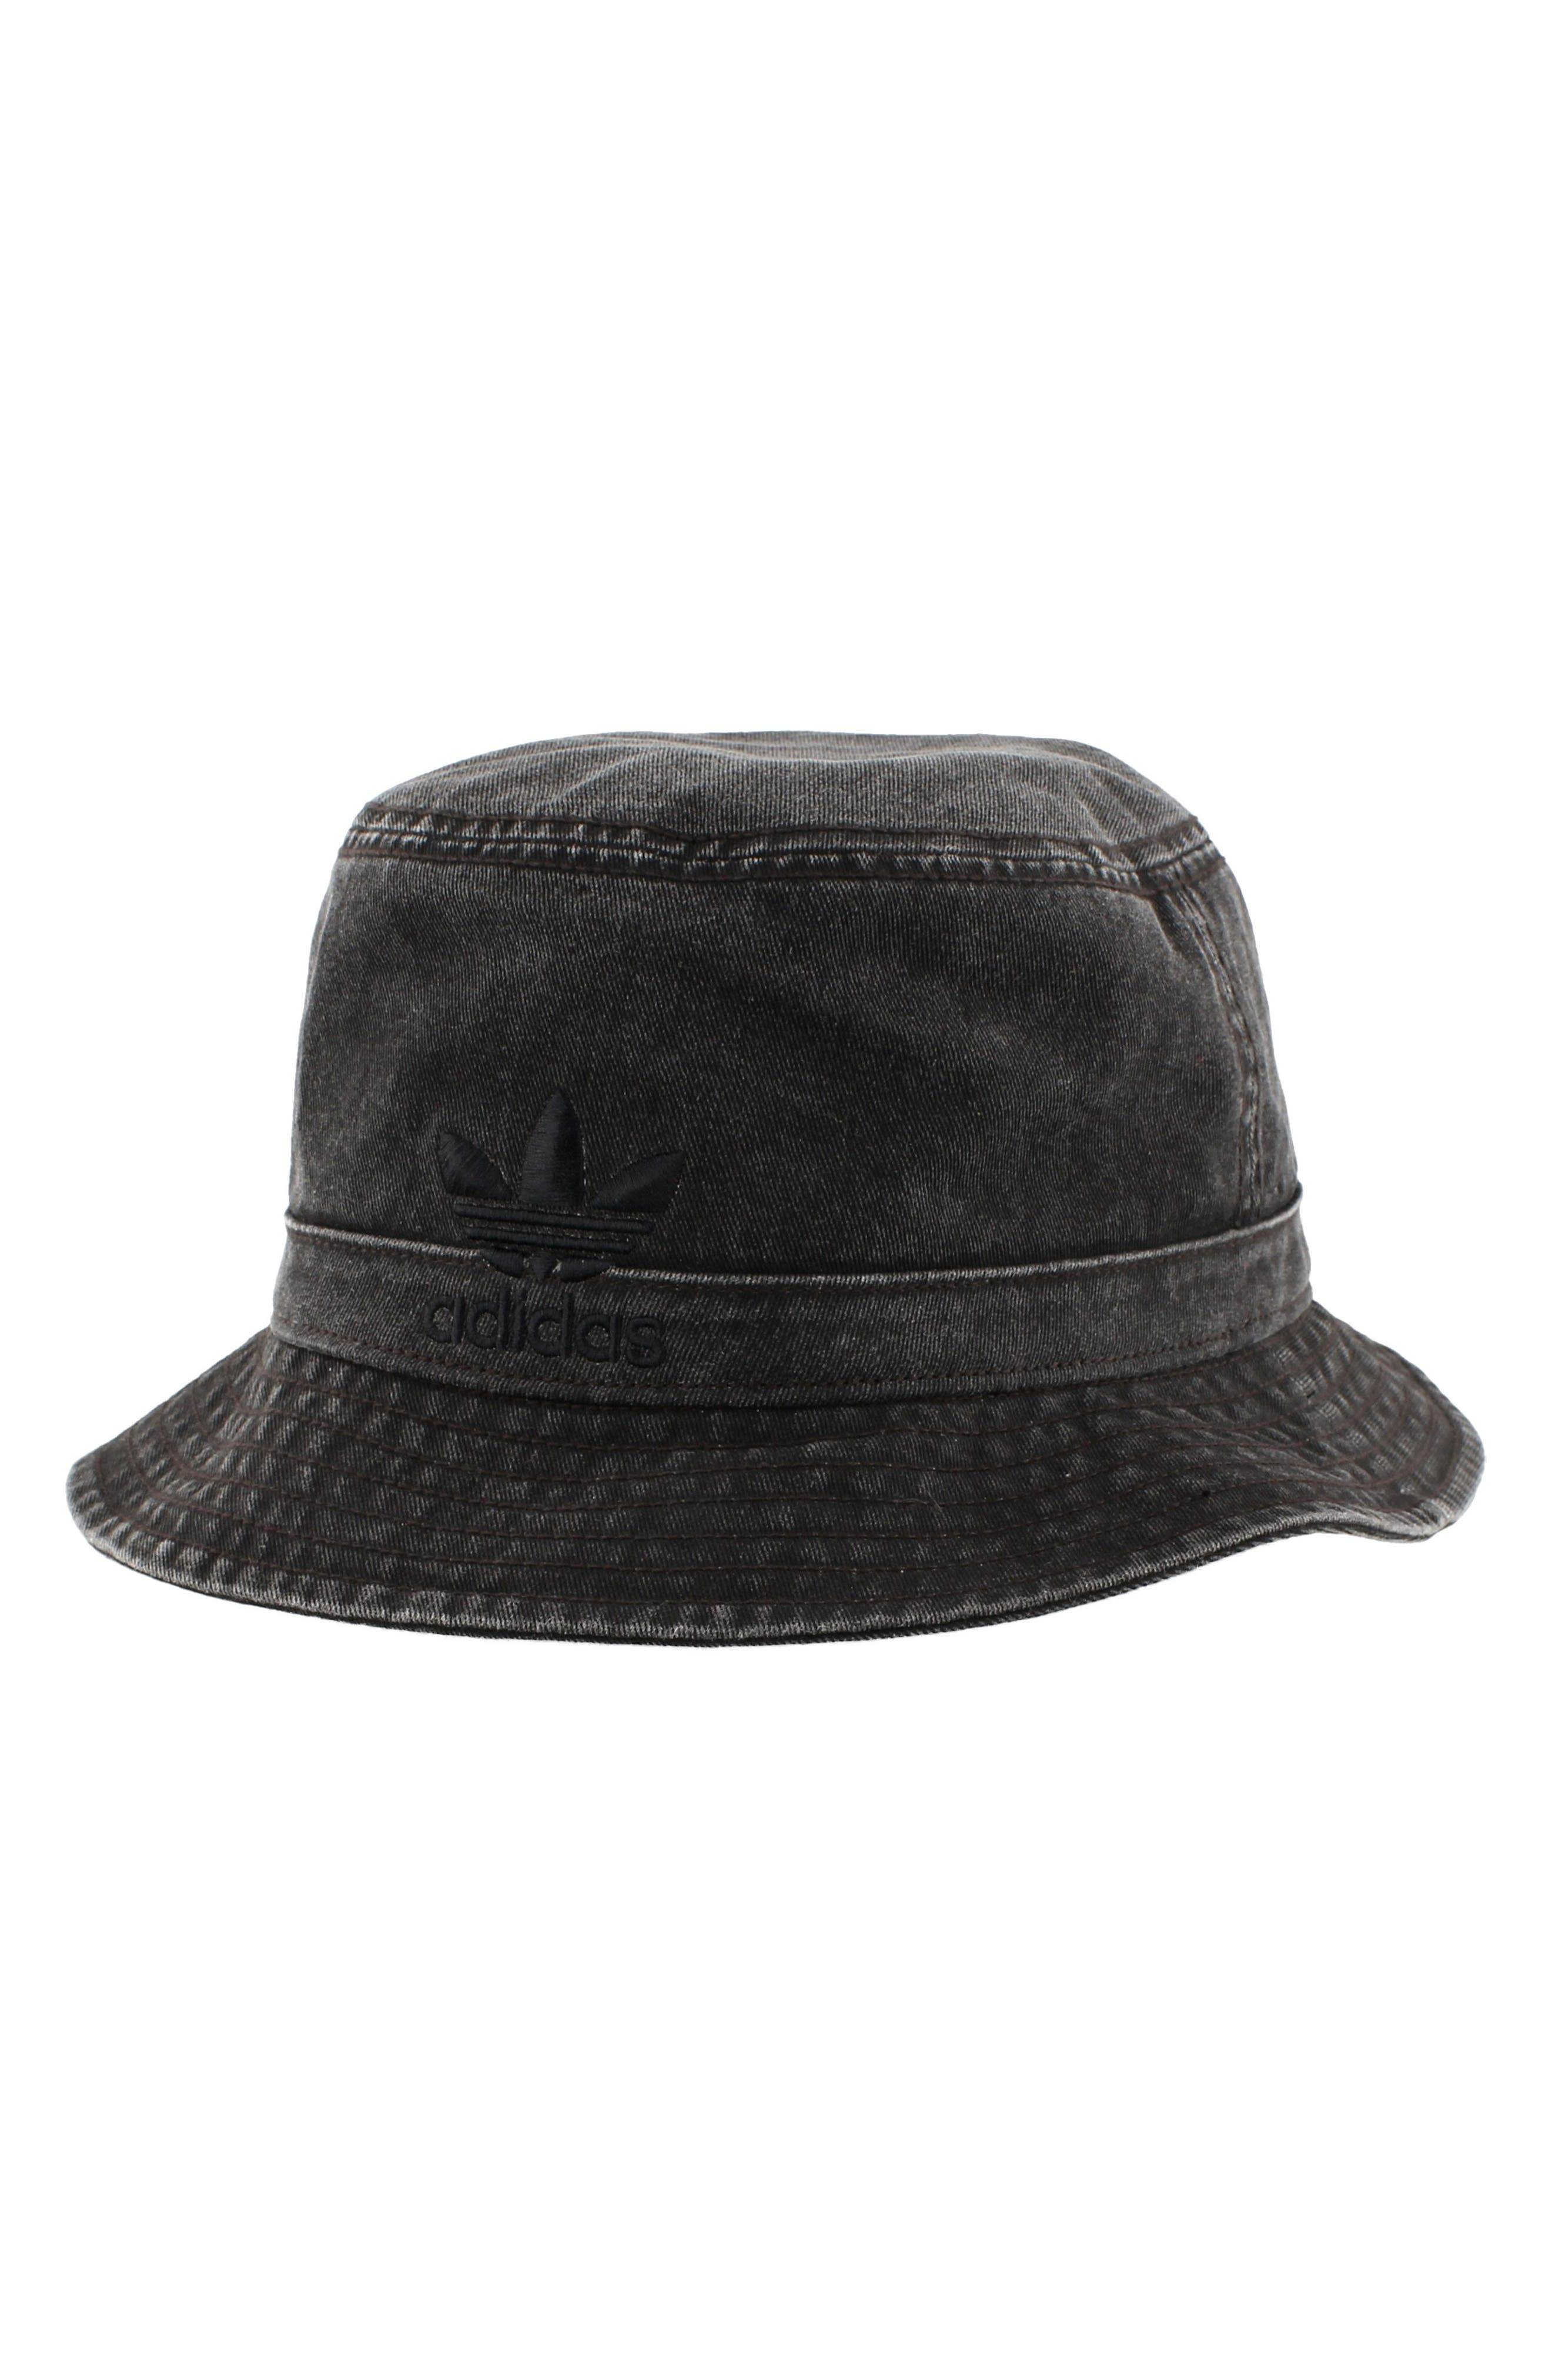 Washed Bucket Hat,                             Main thumbnail 1, color,                             Black/ Black